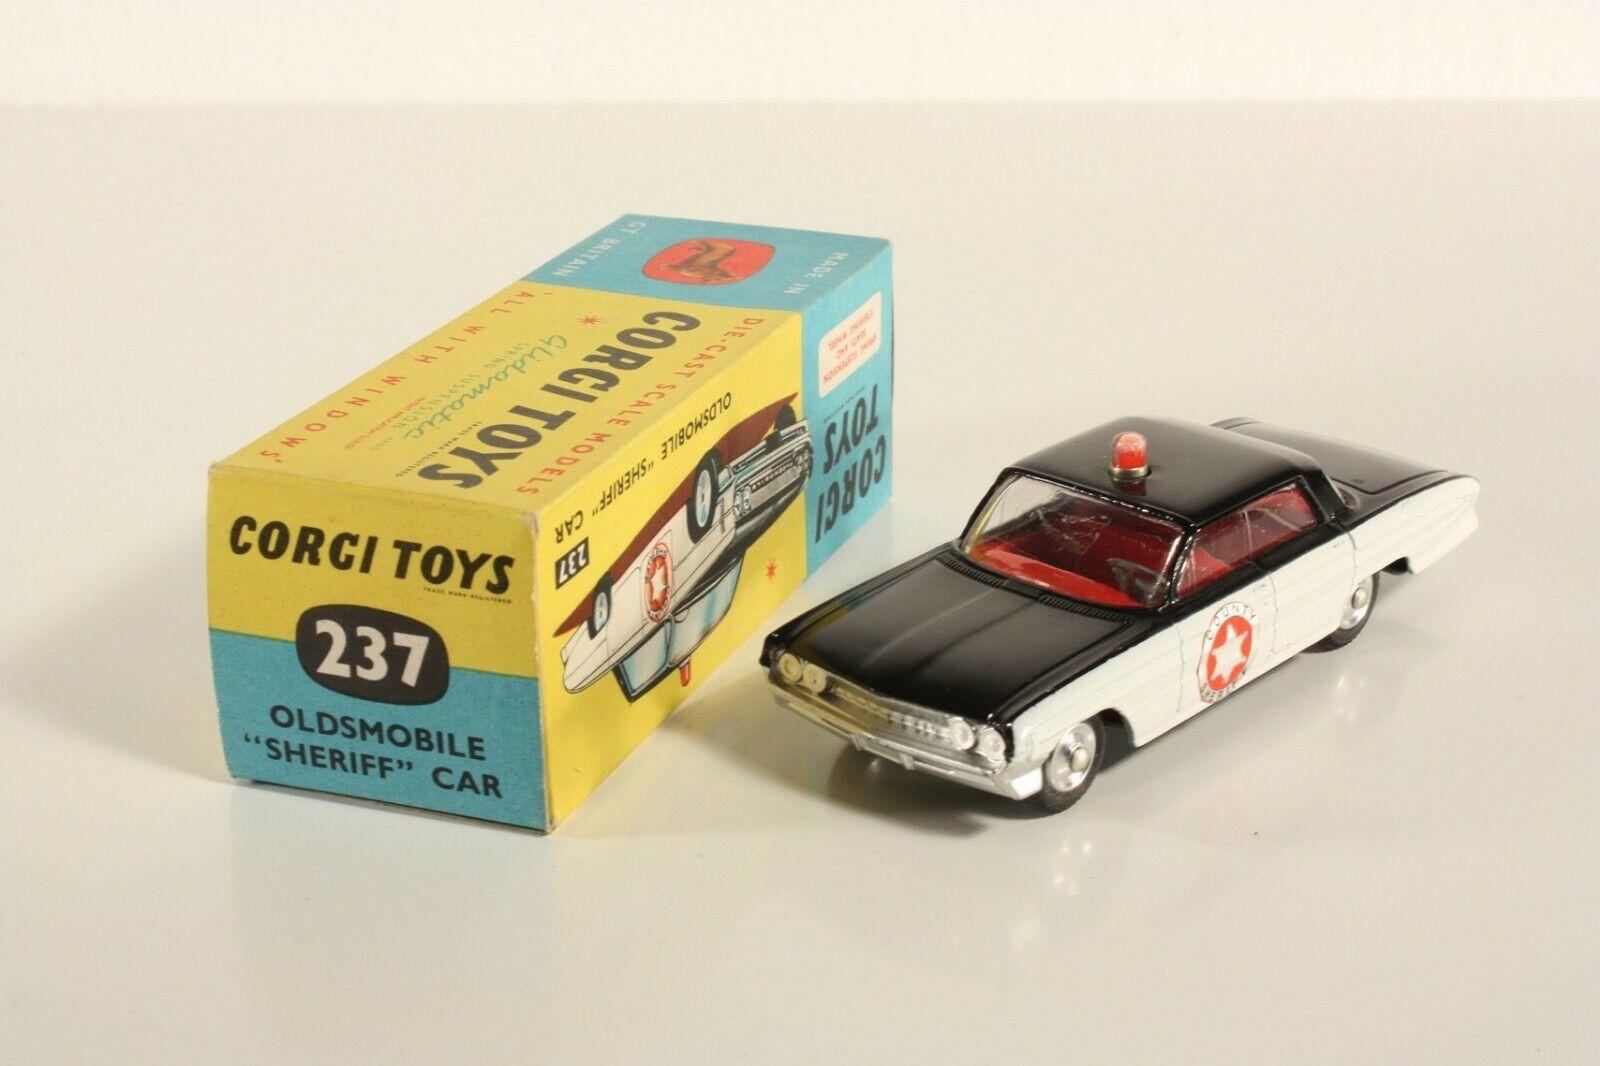 Corgi Spielzeugs 237, Oldsmobile  Sheriff  voiture, Mint in Box                     ab2210